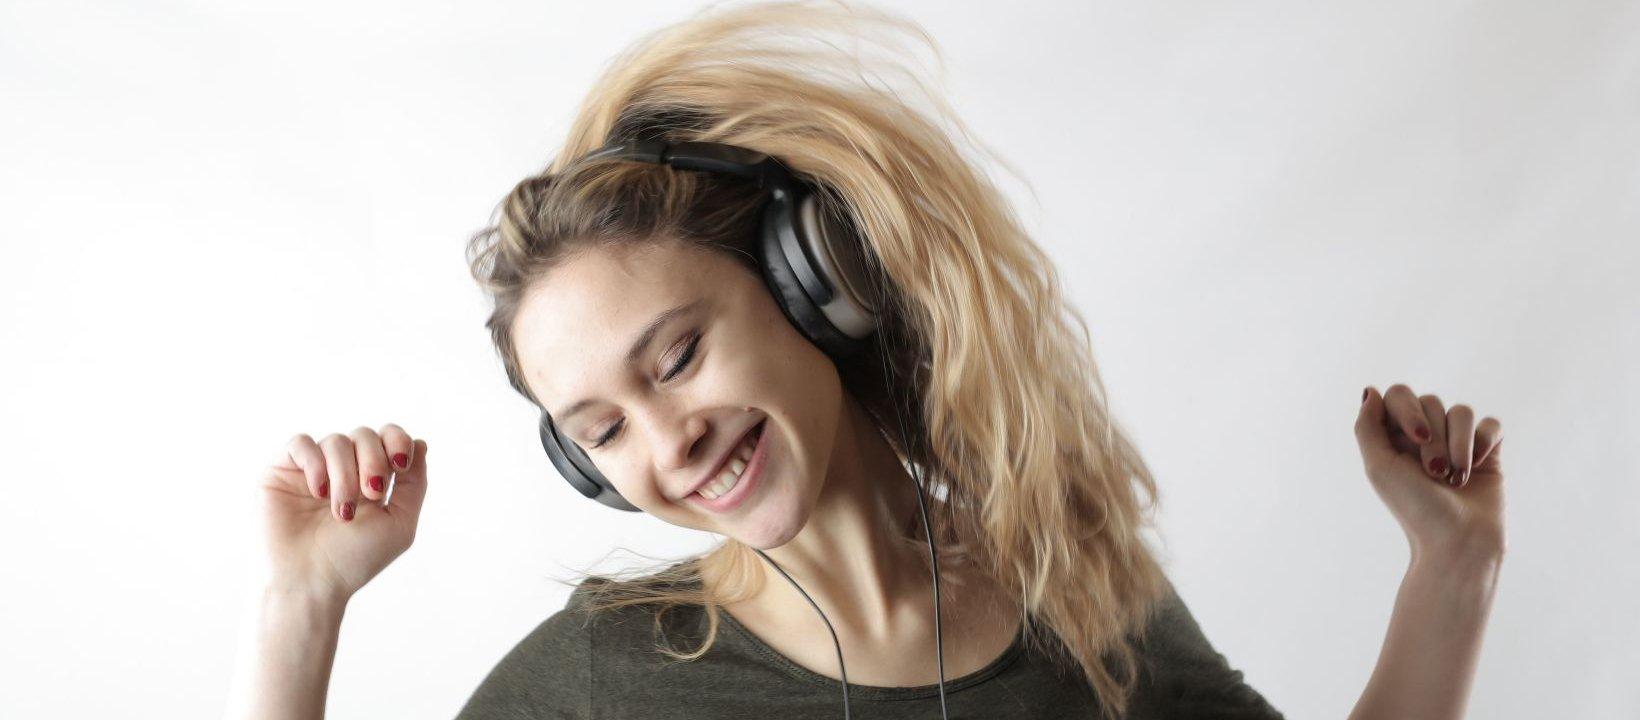 Using Music To Improve Your Focus